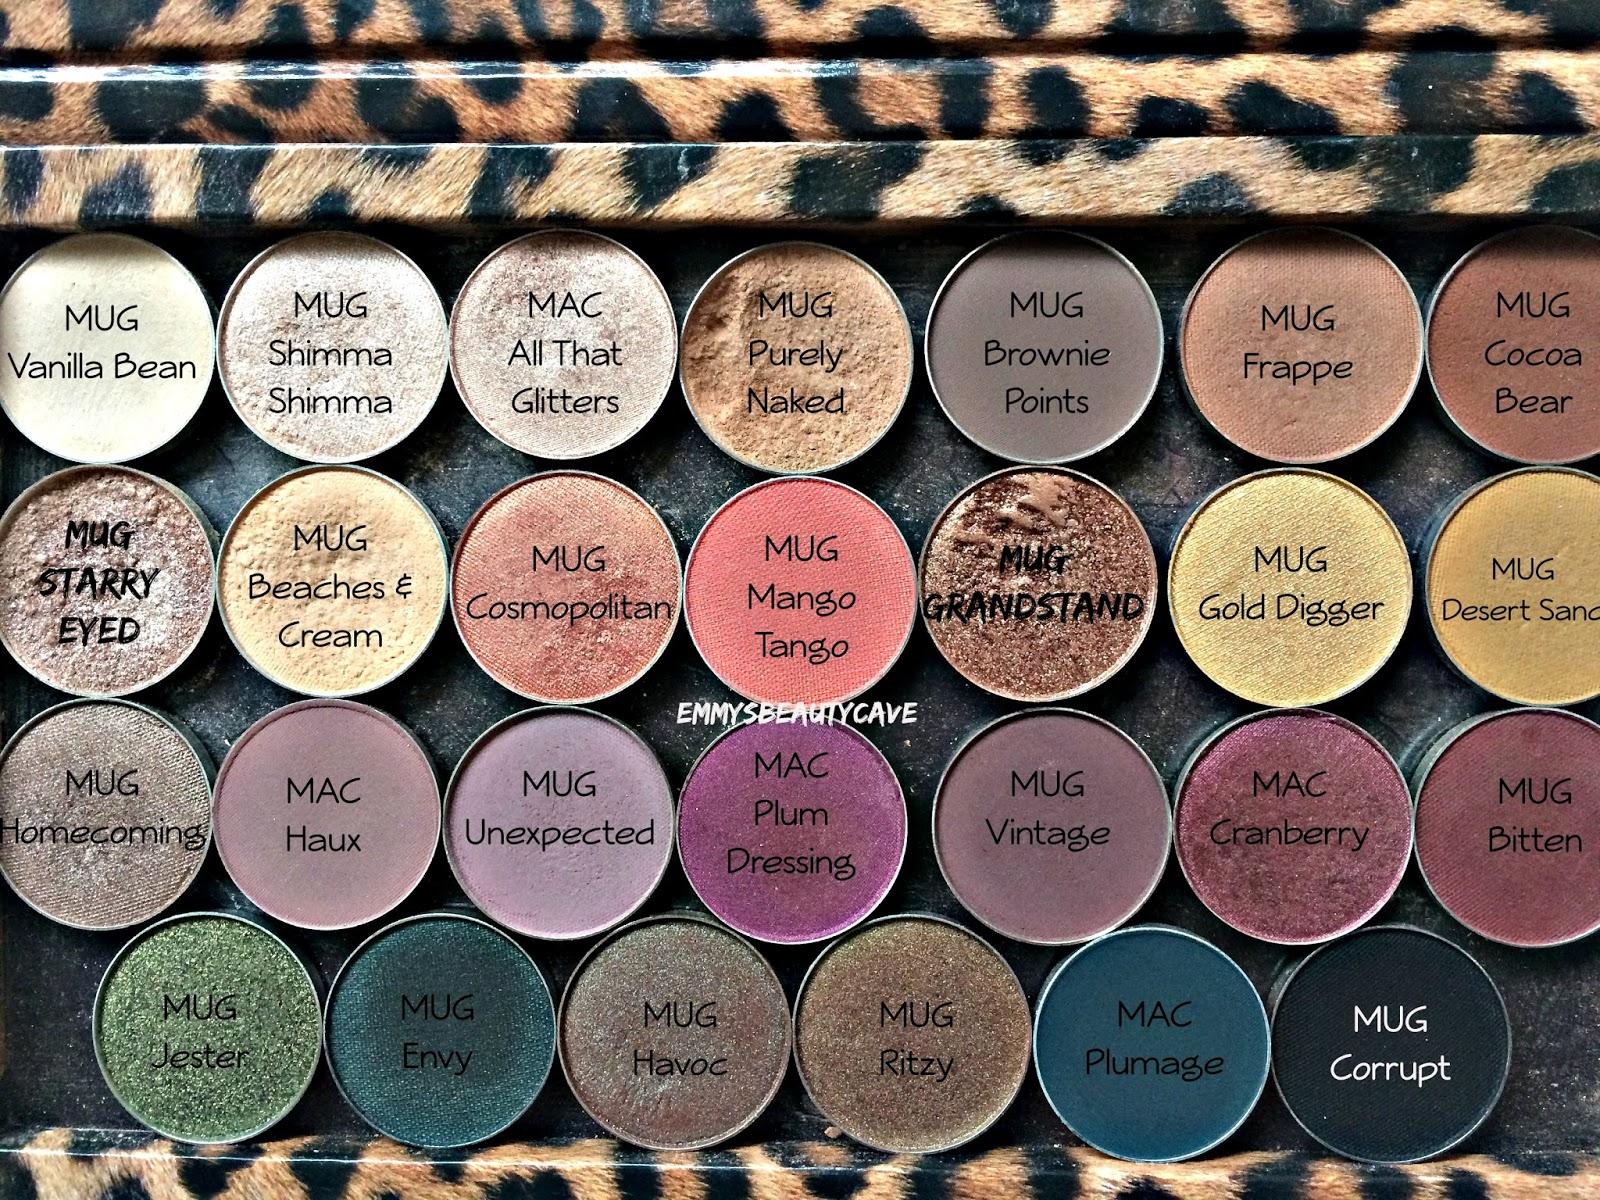 Makeup Geek Eyeshadows, MAC Eye Shadows